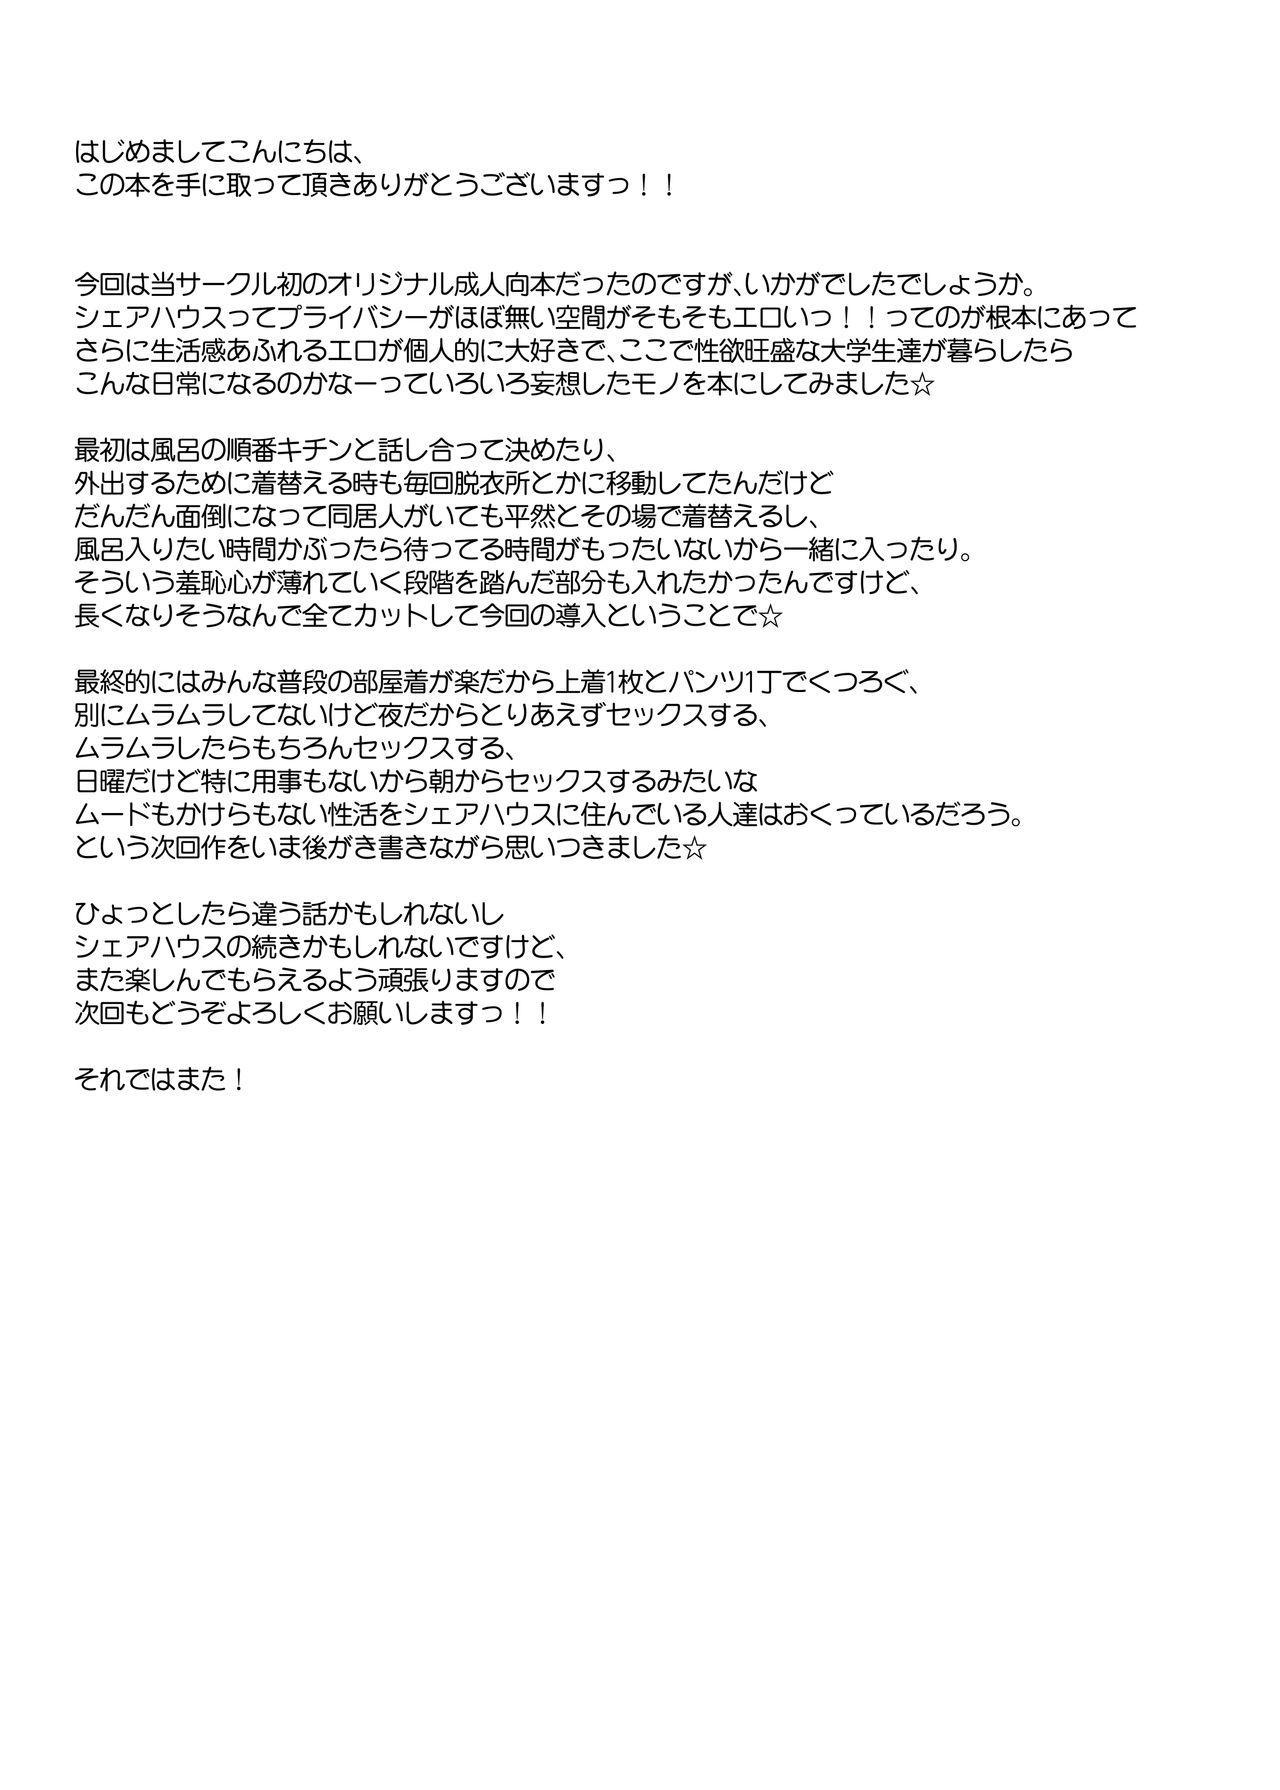 Share House no Seikatsu Rule 22